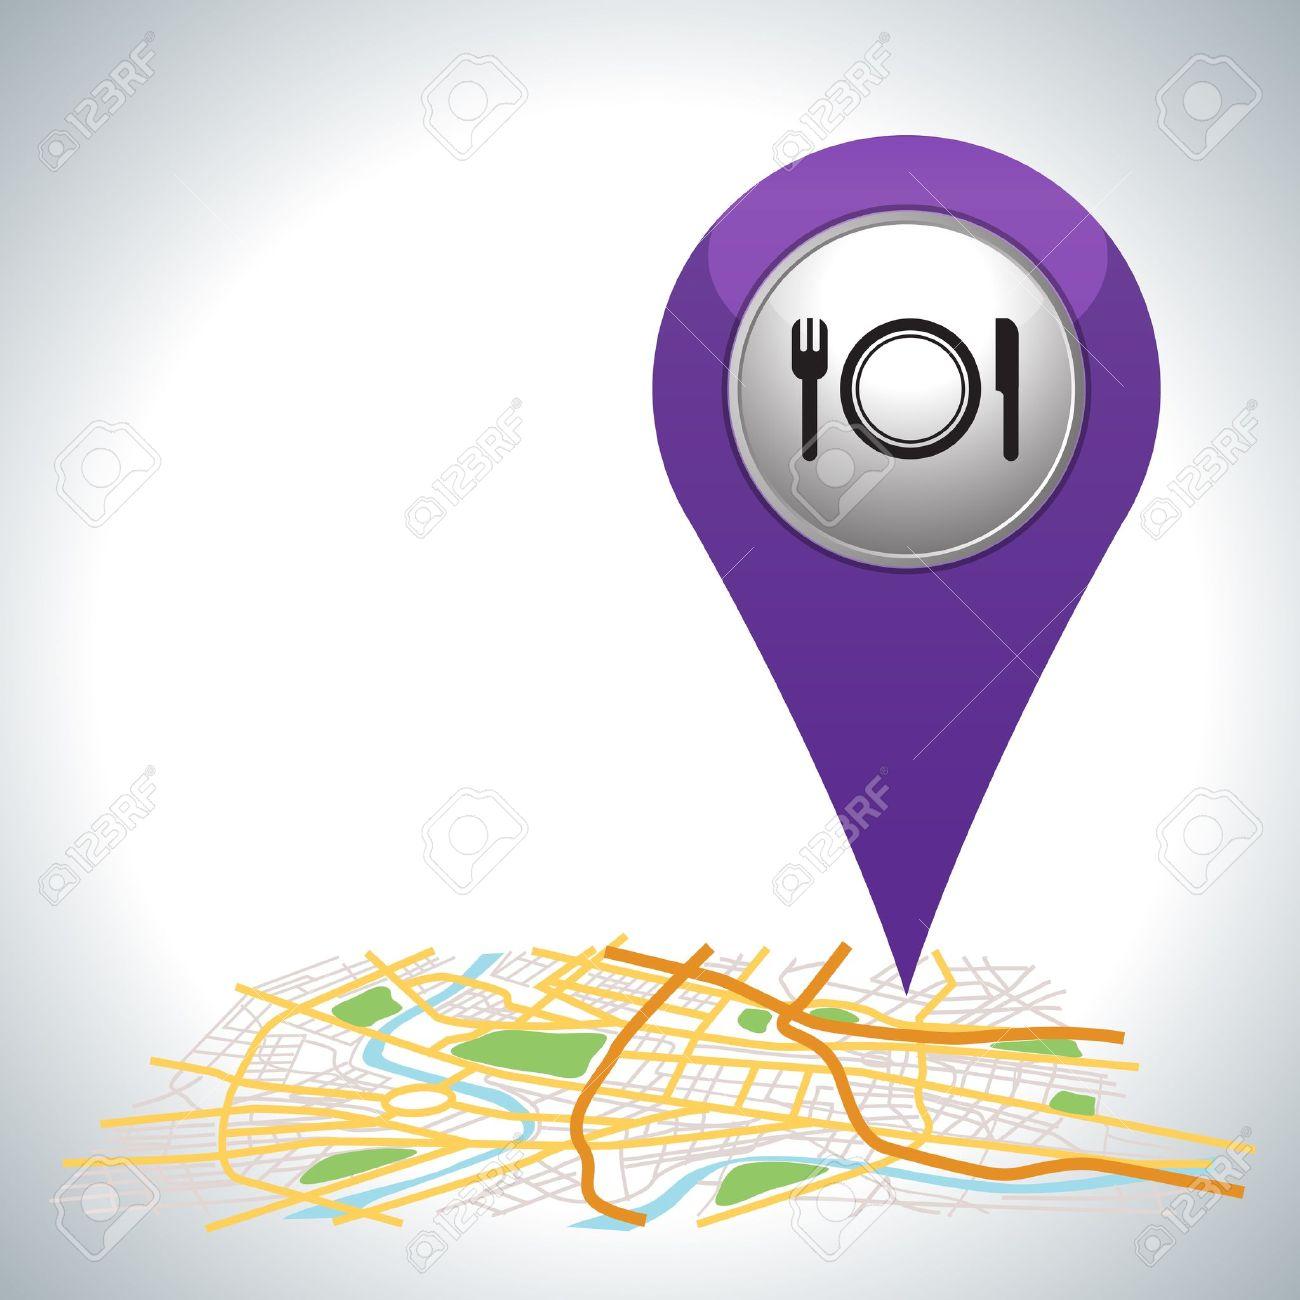 purple restaurant pointer on map location Stock Vector - 21189498